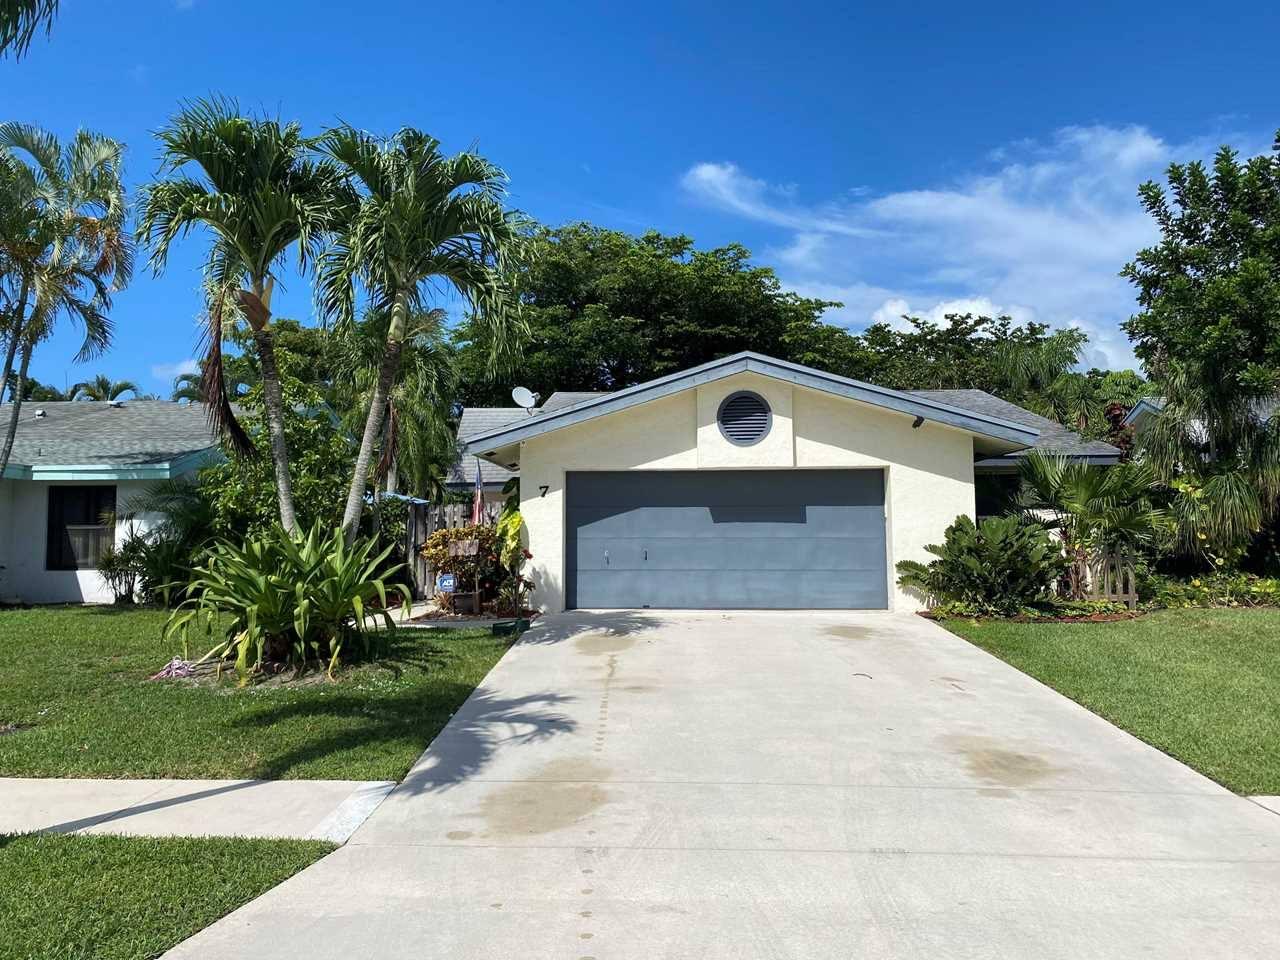 7 Baytree Cir, Boynton Beach, FL 33436 was sold by top Boynton Beach agents in Meadows